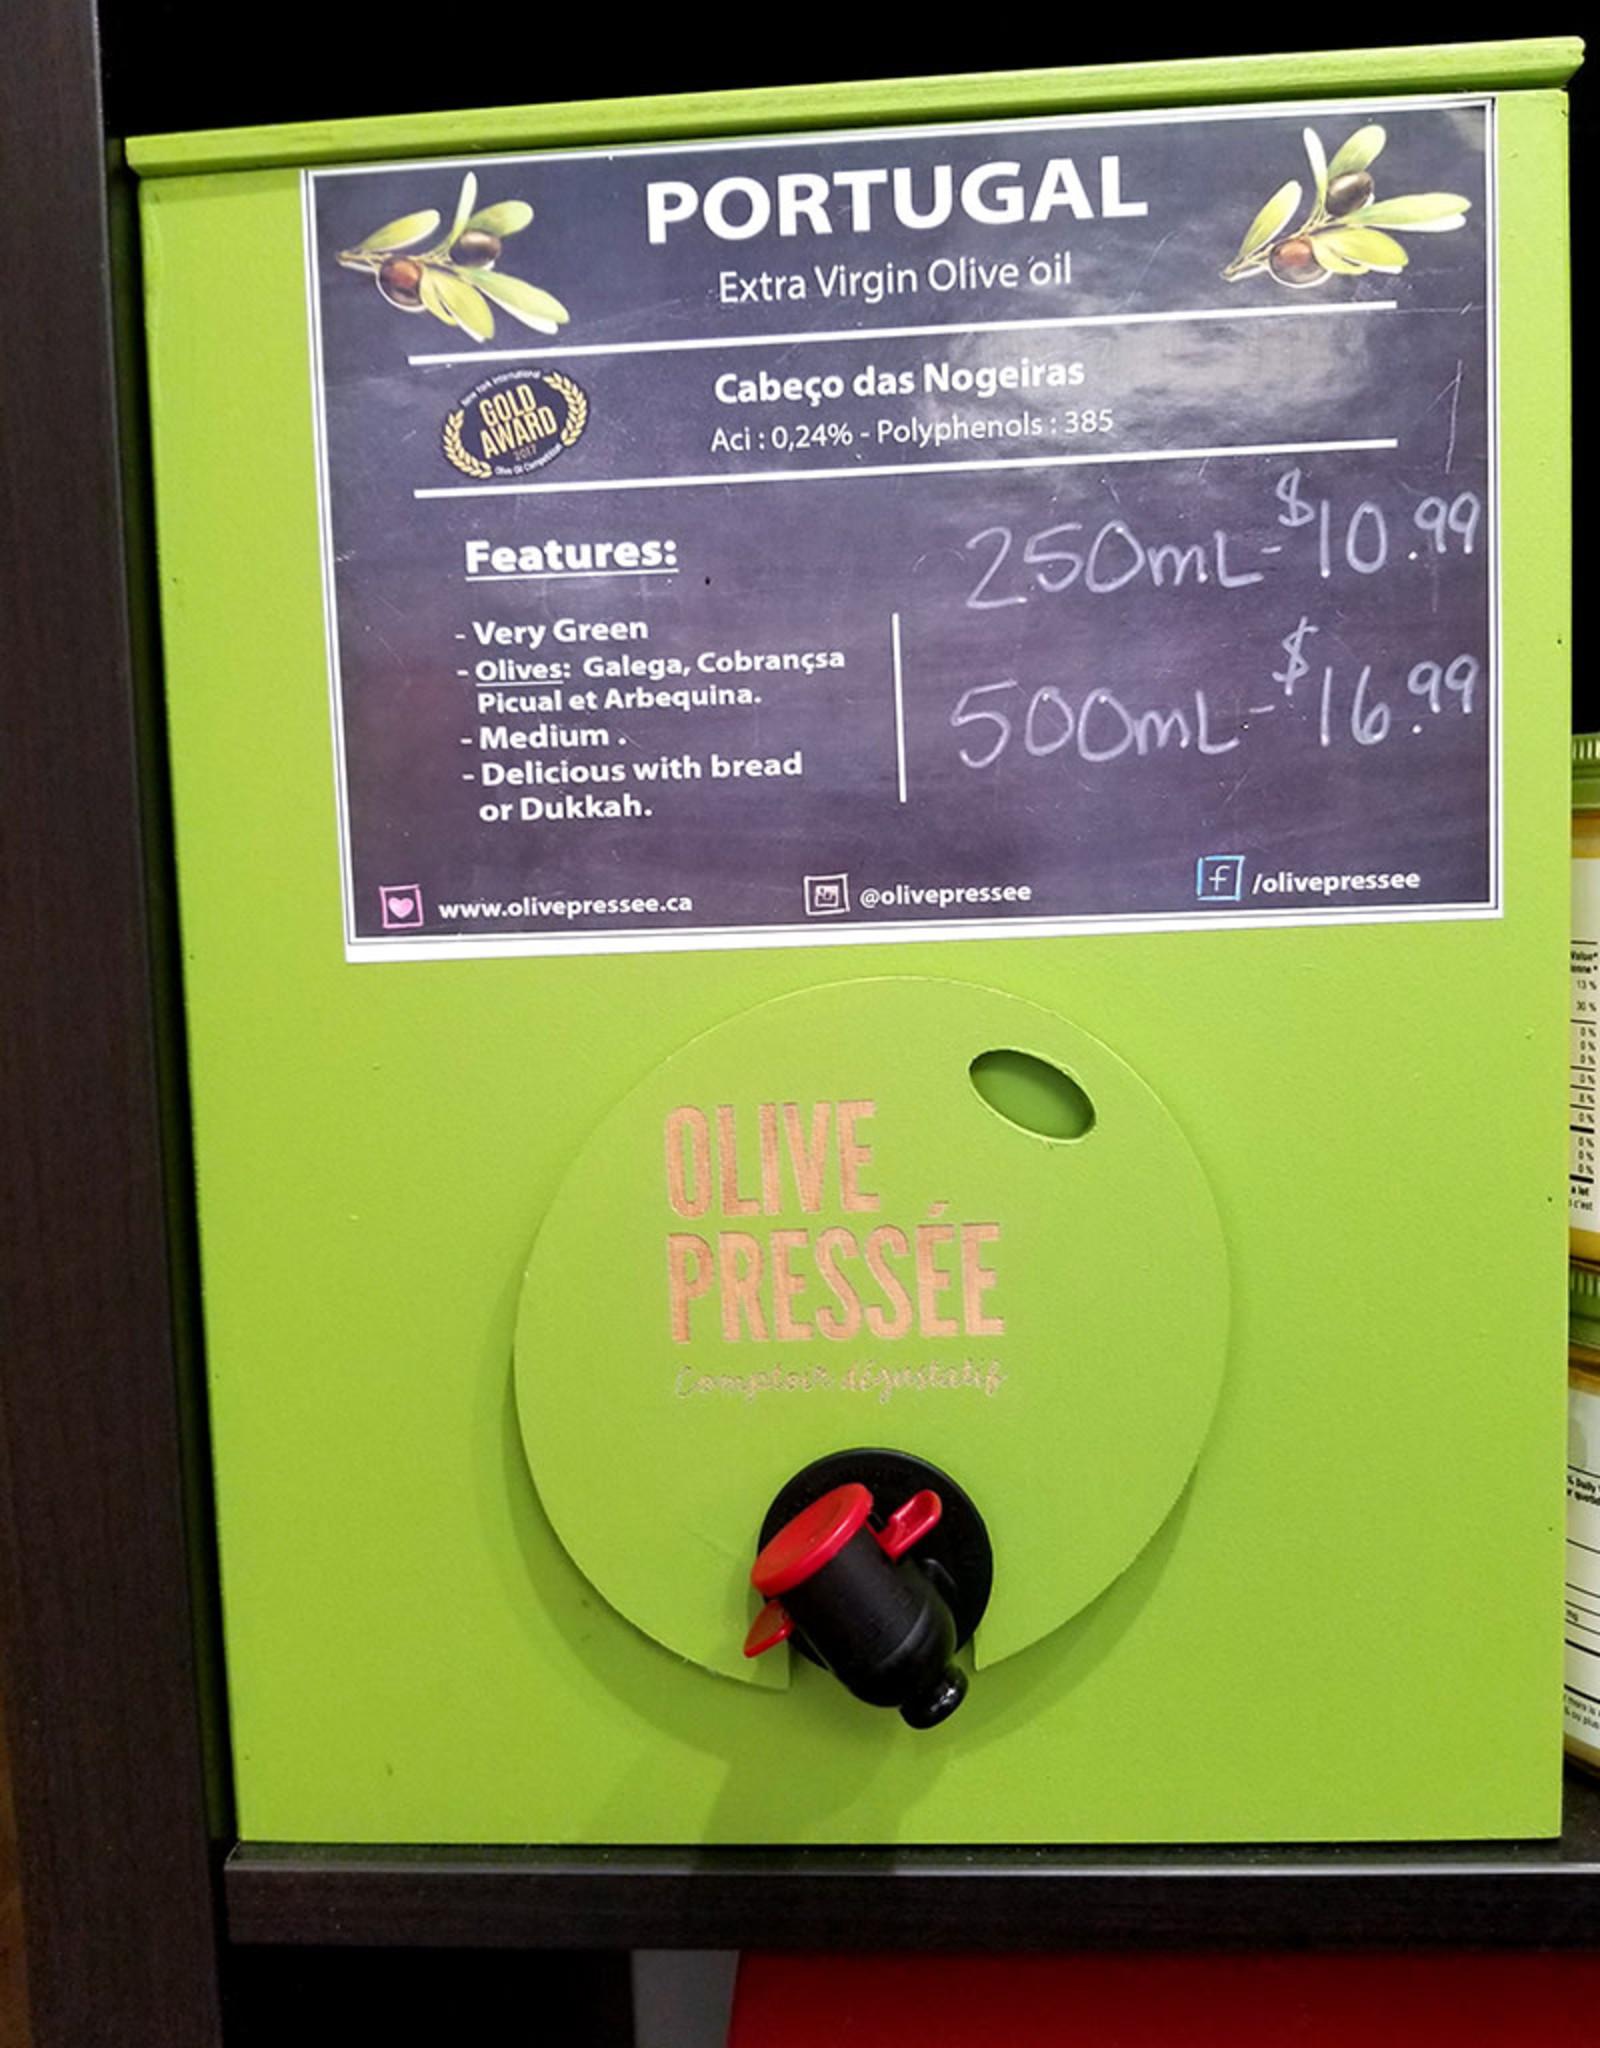 Olive Pressee Olive Pressee - Portugal EVOO, 500ml